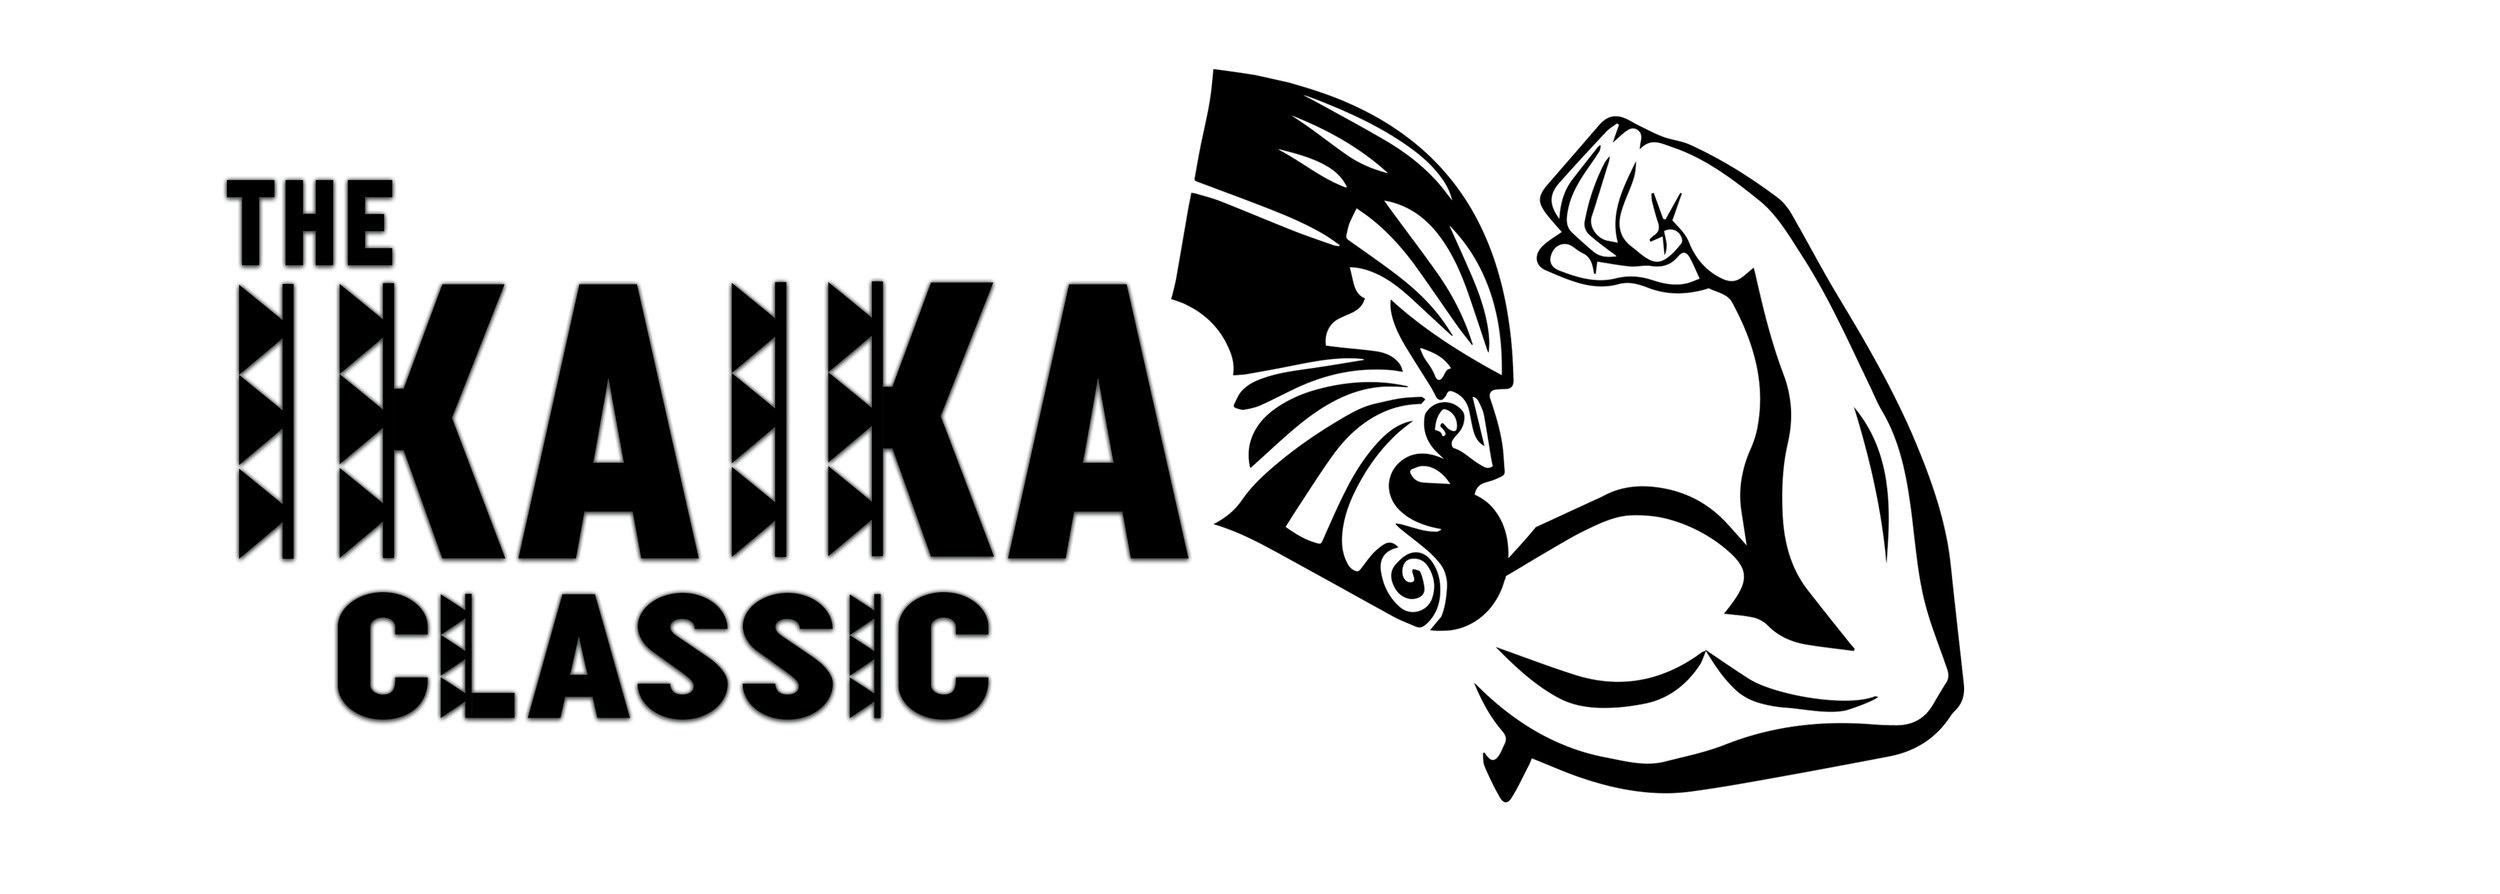 Ikaika Classic